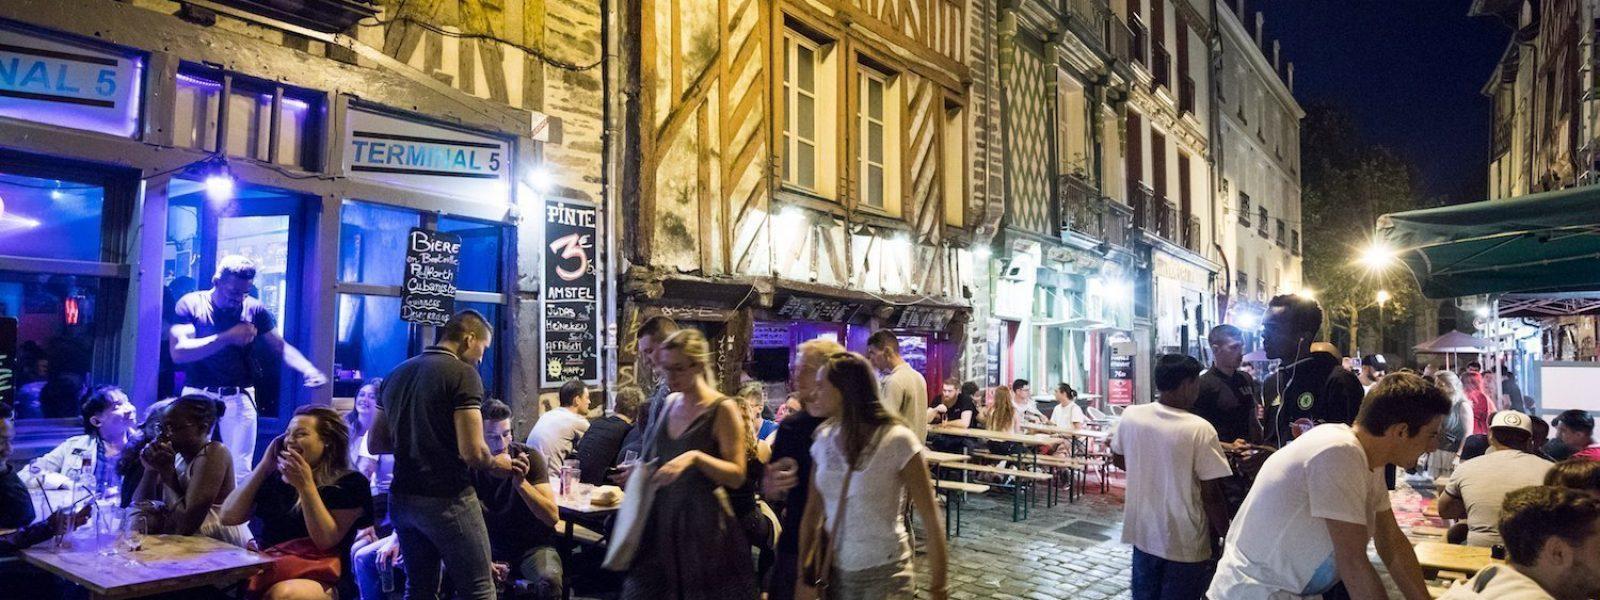 The Saint-Michel street : the Drinker's Alley in Rennes